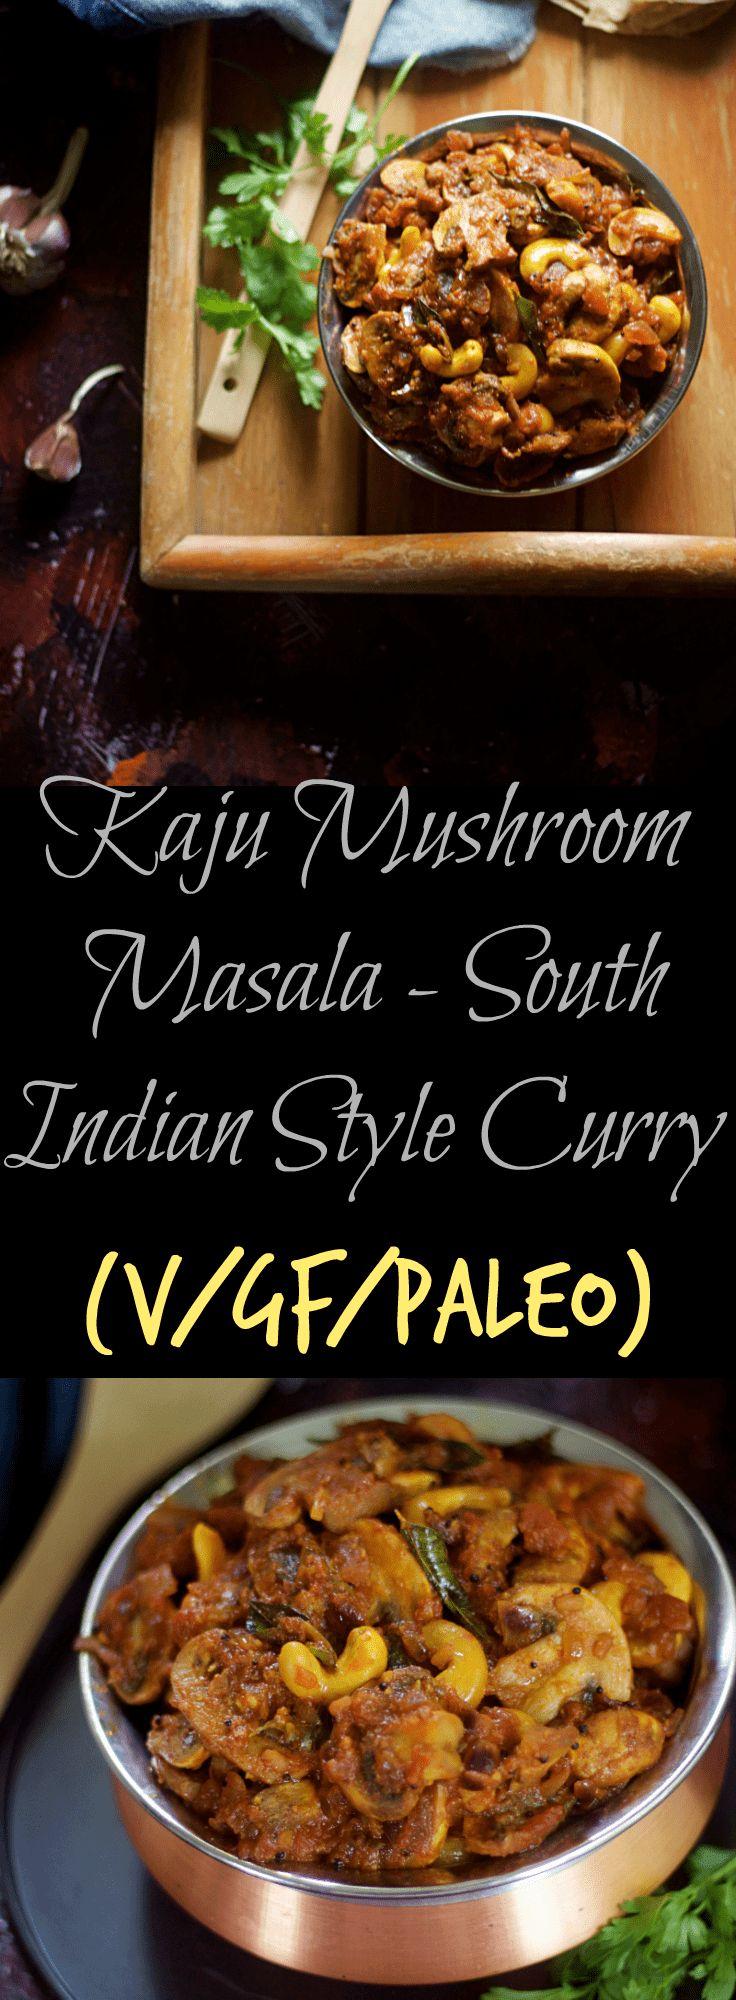 kaju-mushroom-masala- south-indian-style-curry indian masala mushroom photography roti rice naan vegan gluten free paleo recipes